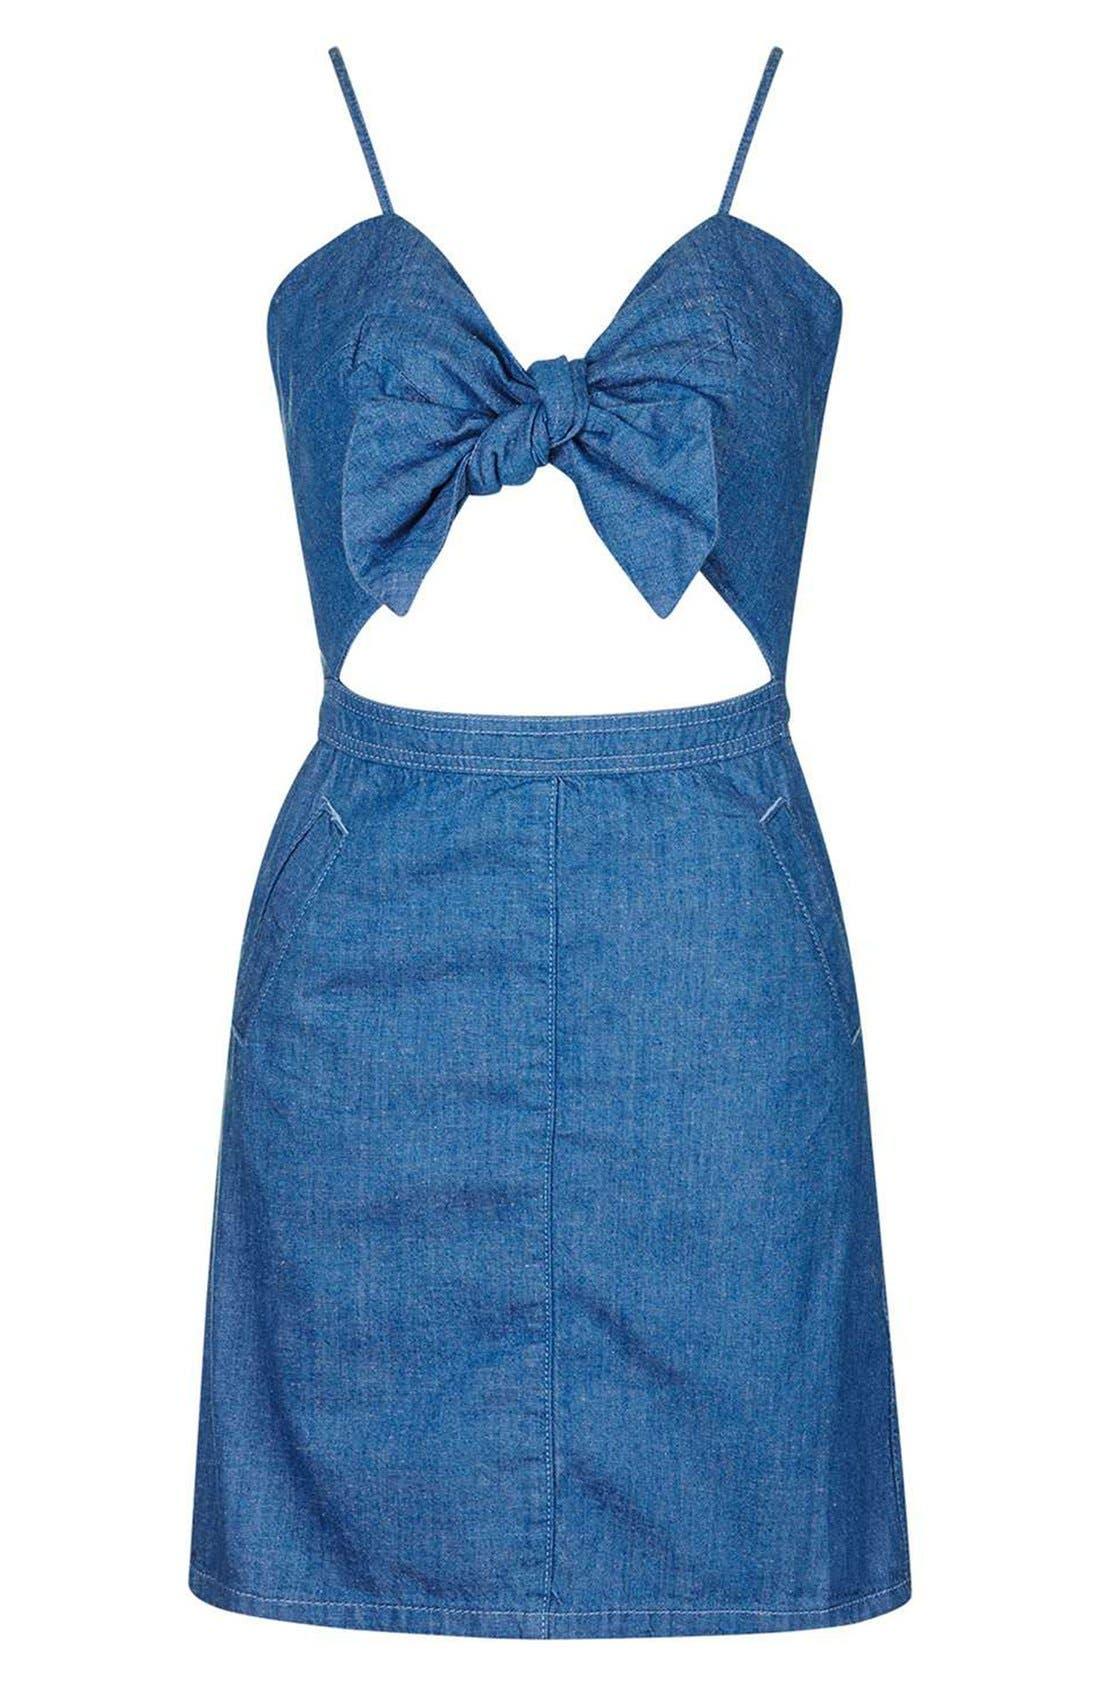 Alternate Image 3  - Topshop Bow Front Denim Minidress (Petite)